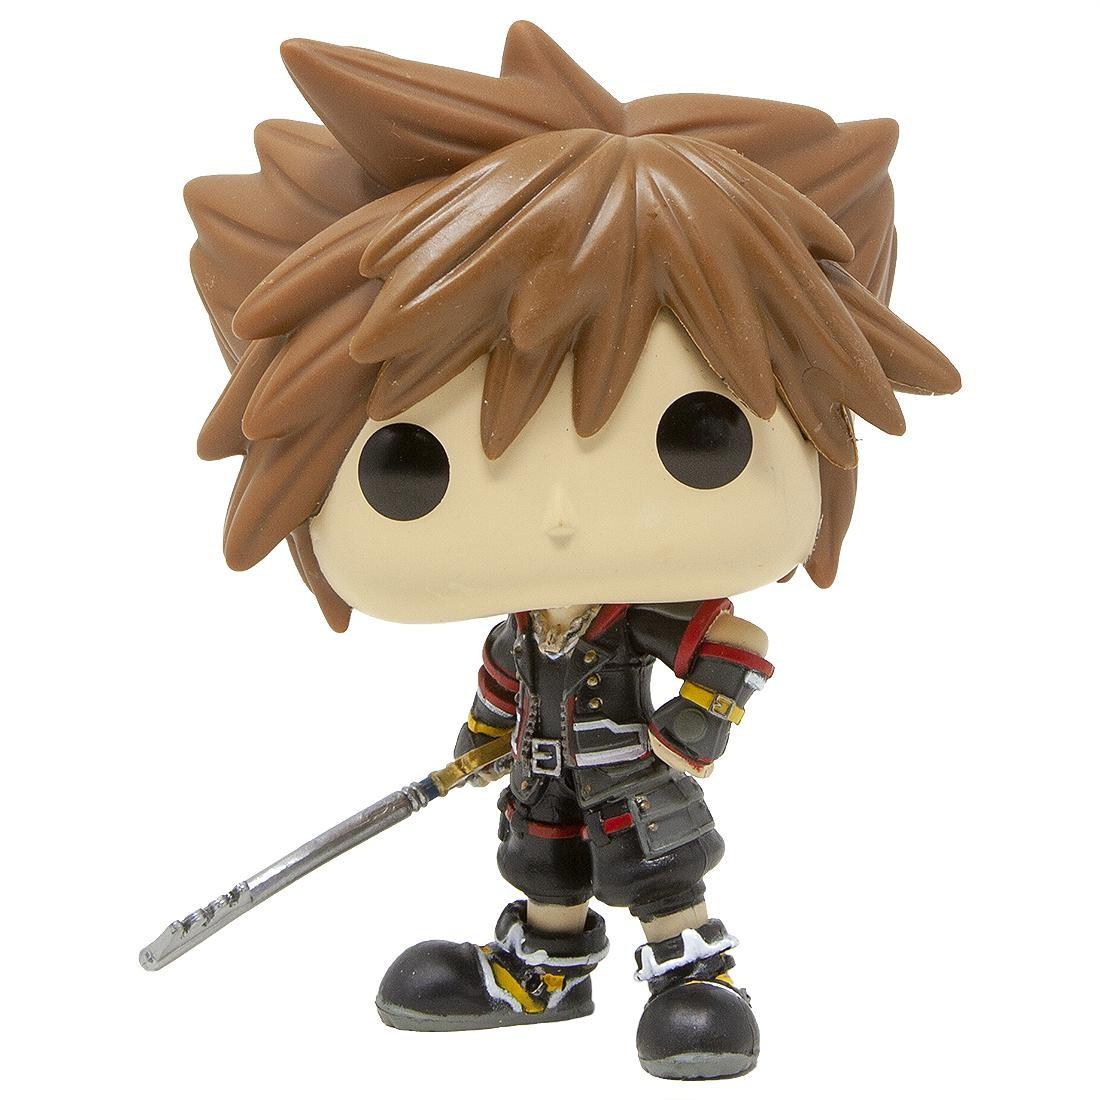 Funko POP Disney Kingdom Hearts 3 Sora Figure (brown)